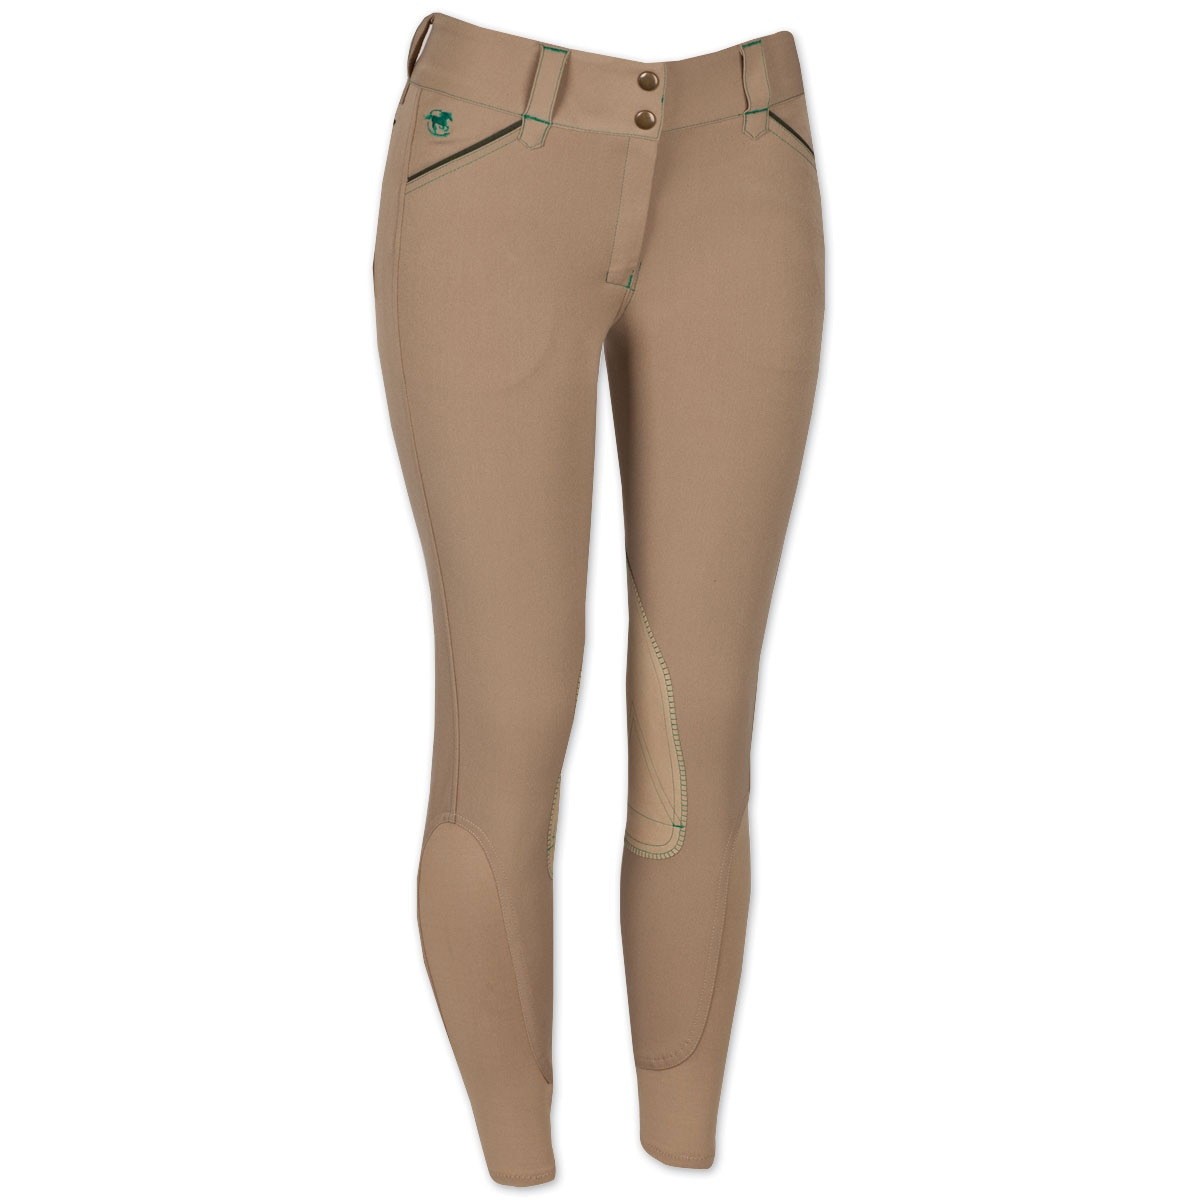 Piper Breeches by SmartPak - Original Knee Patch- Sale!